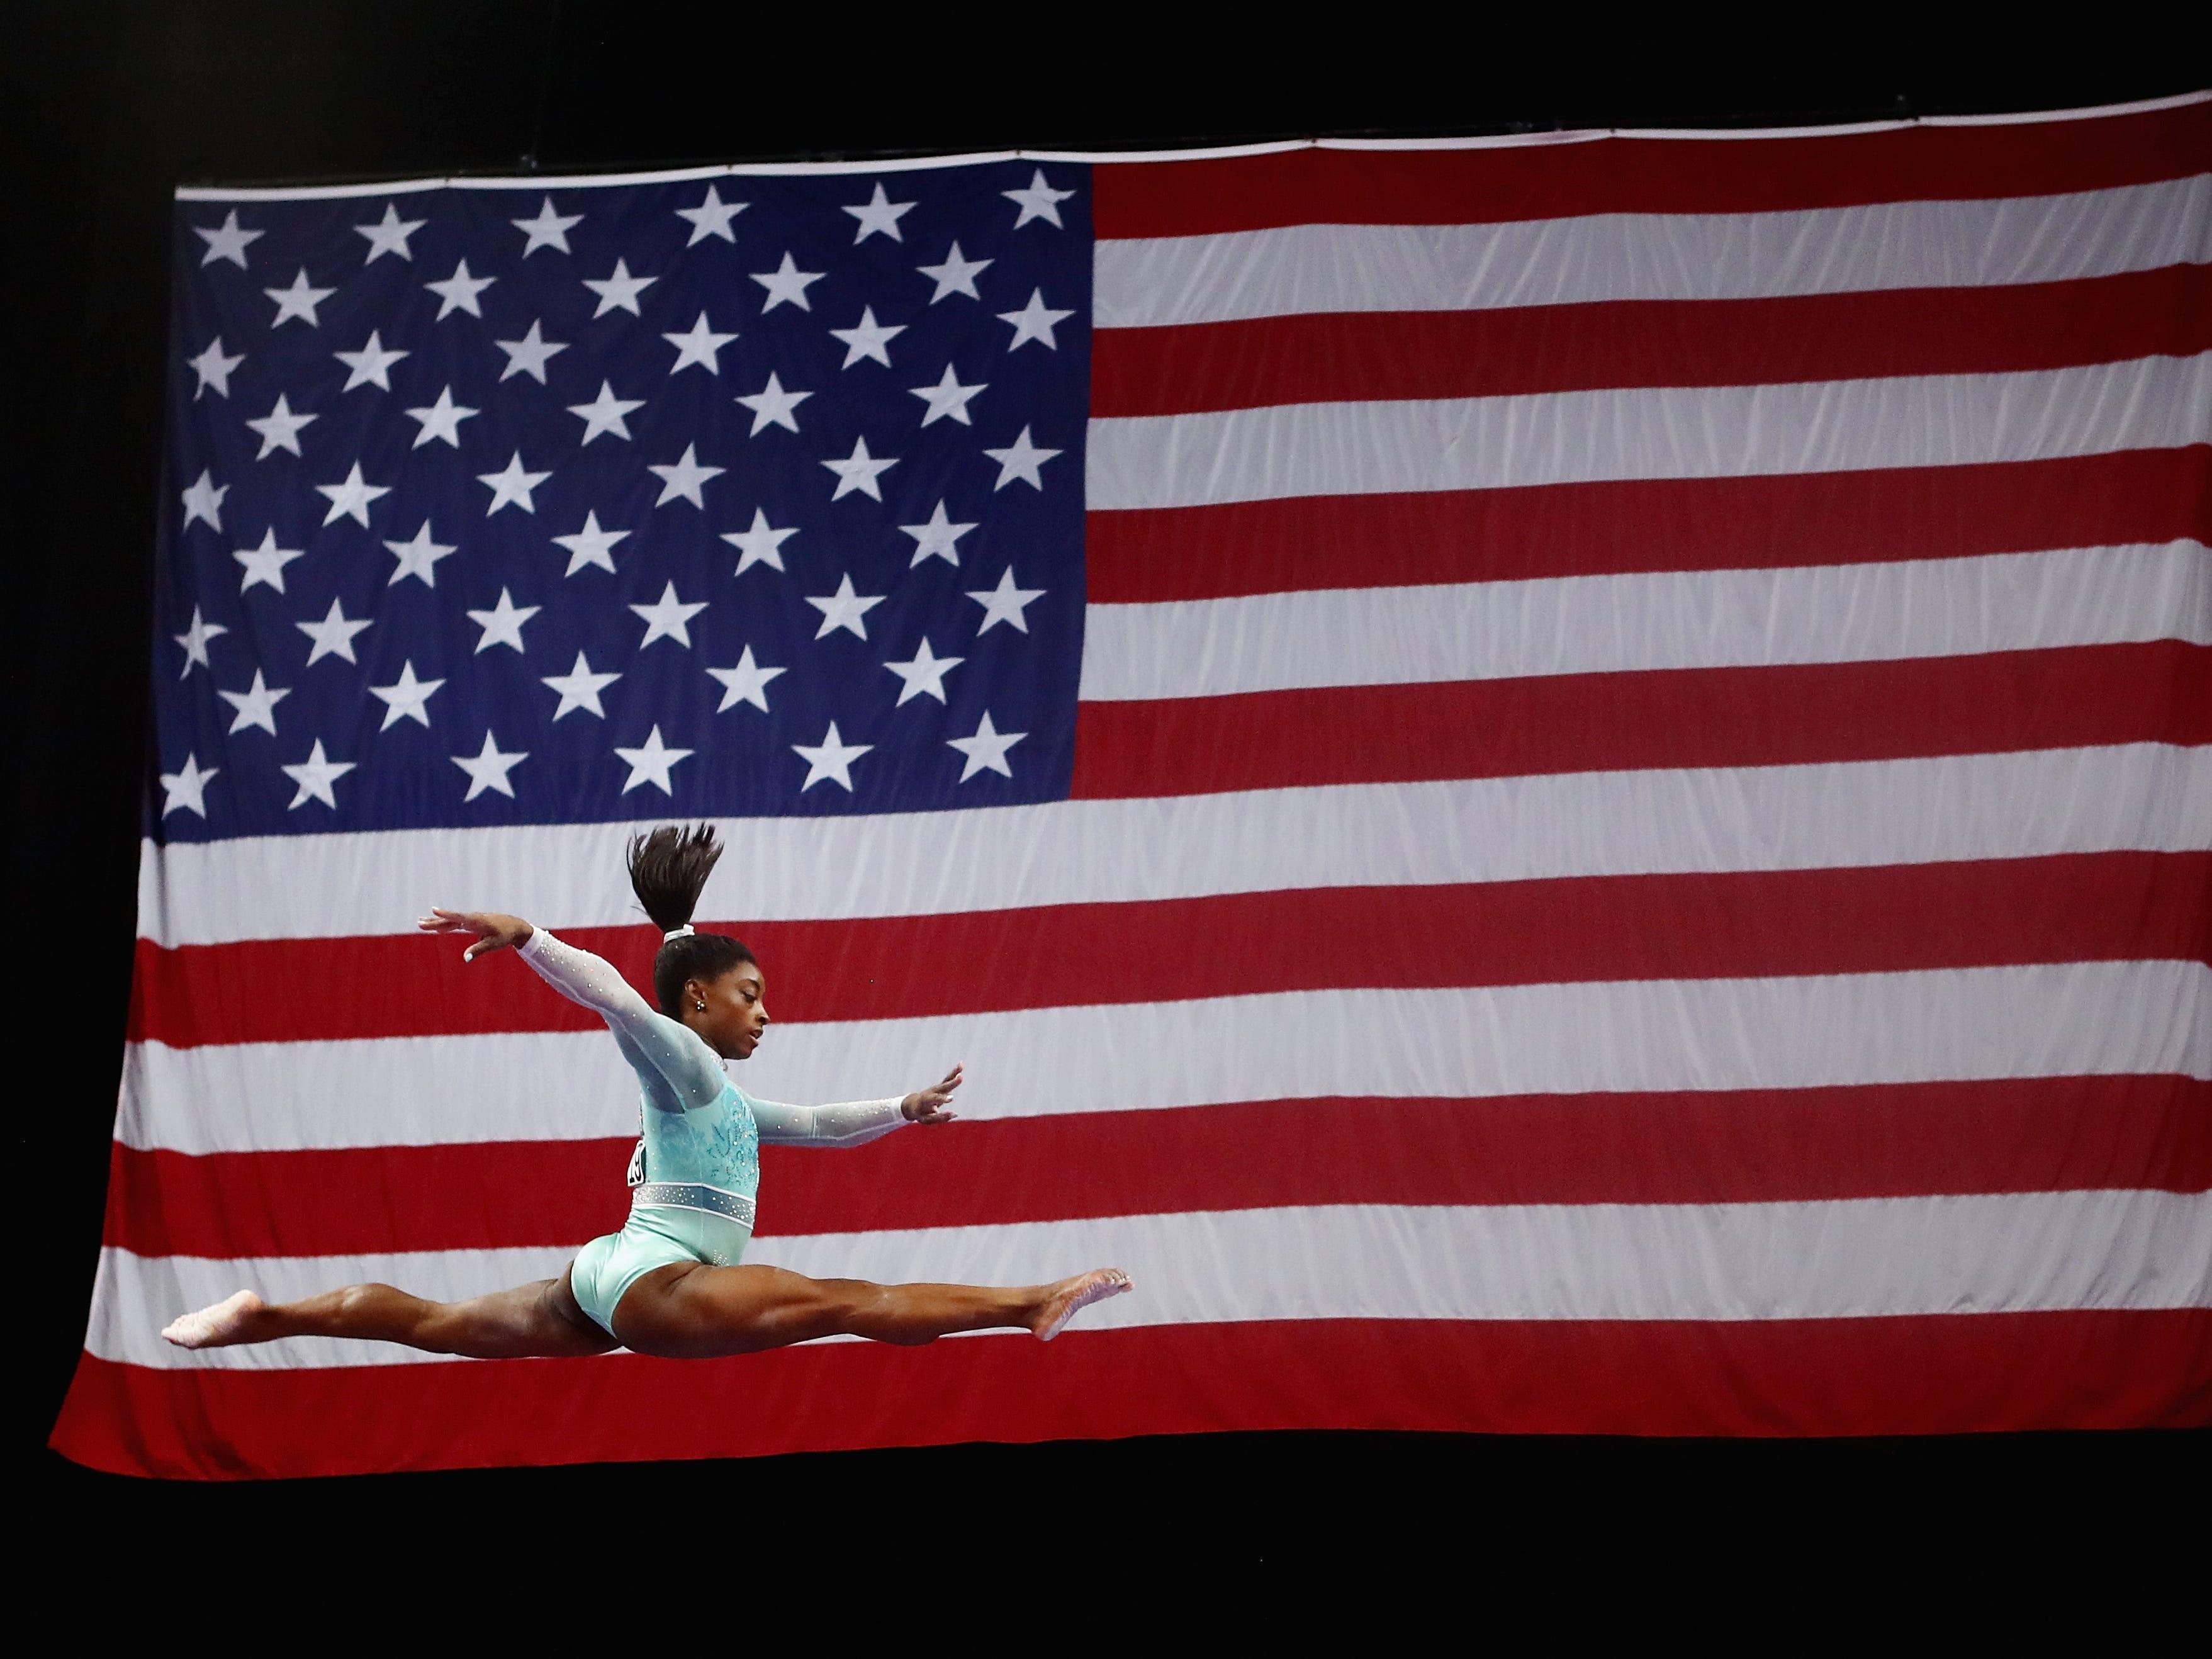 Simone Biles competes on the balance beam at the U.S. Gymnastics Championships.